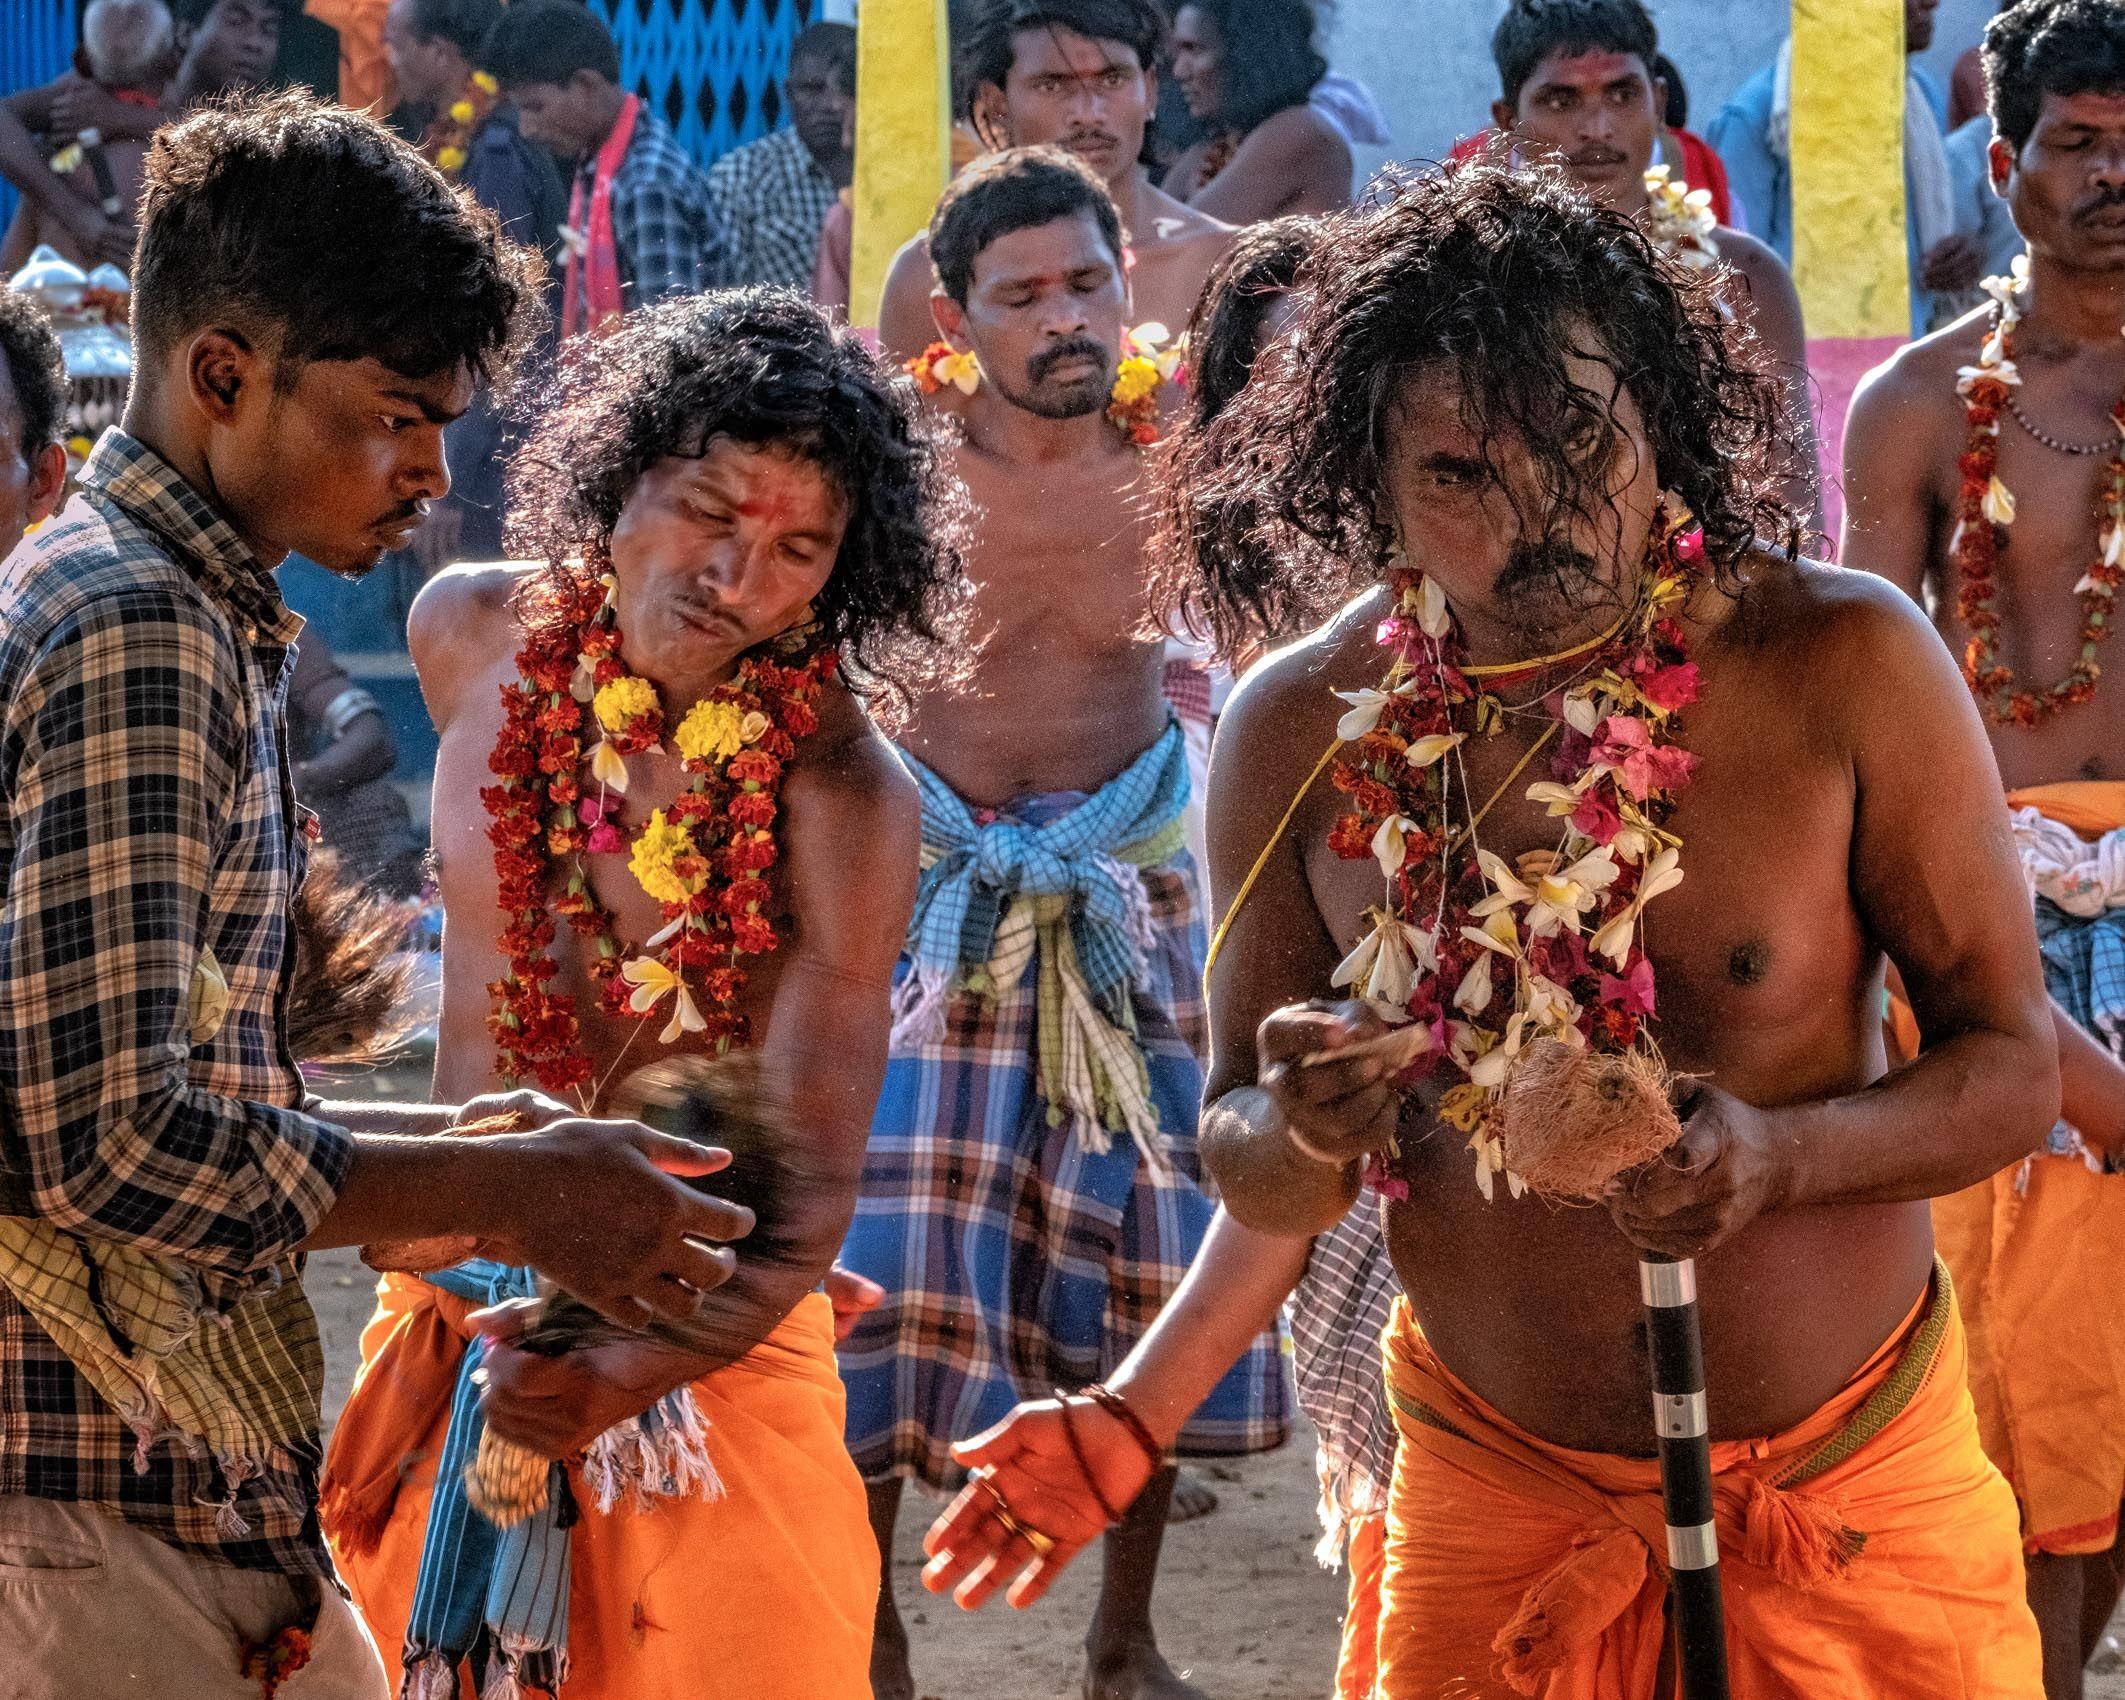 TRIBAL ODISHA AND CHHATTISGARH II:  Chhattisgarh's Madai Festival